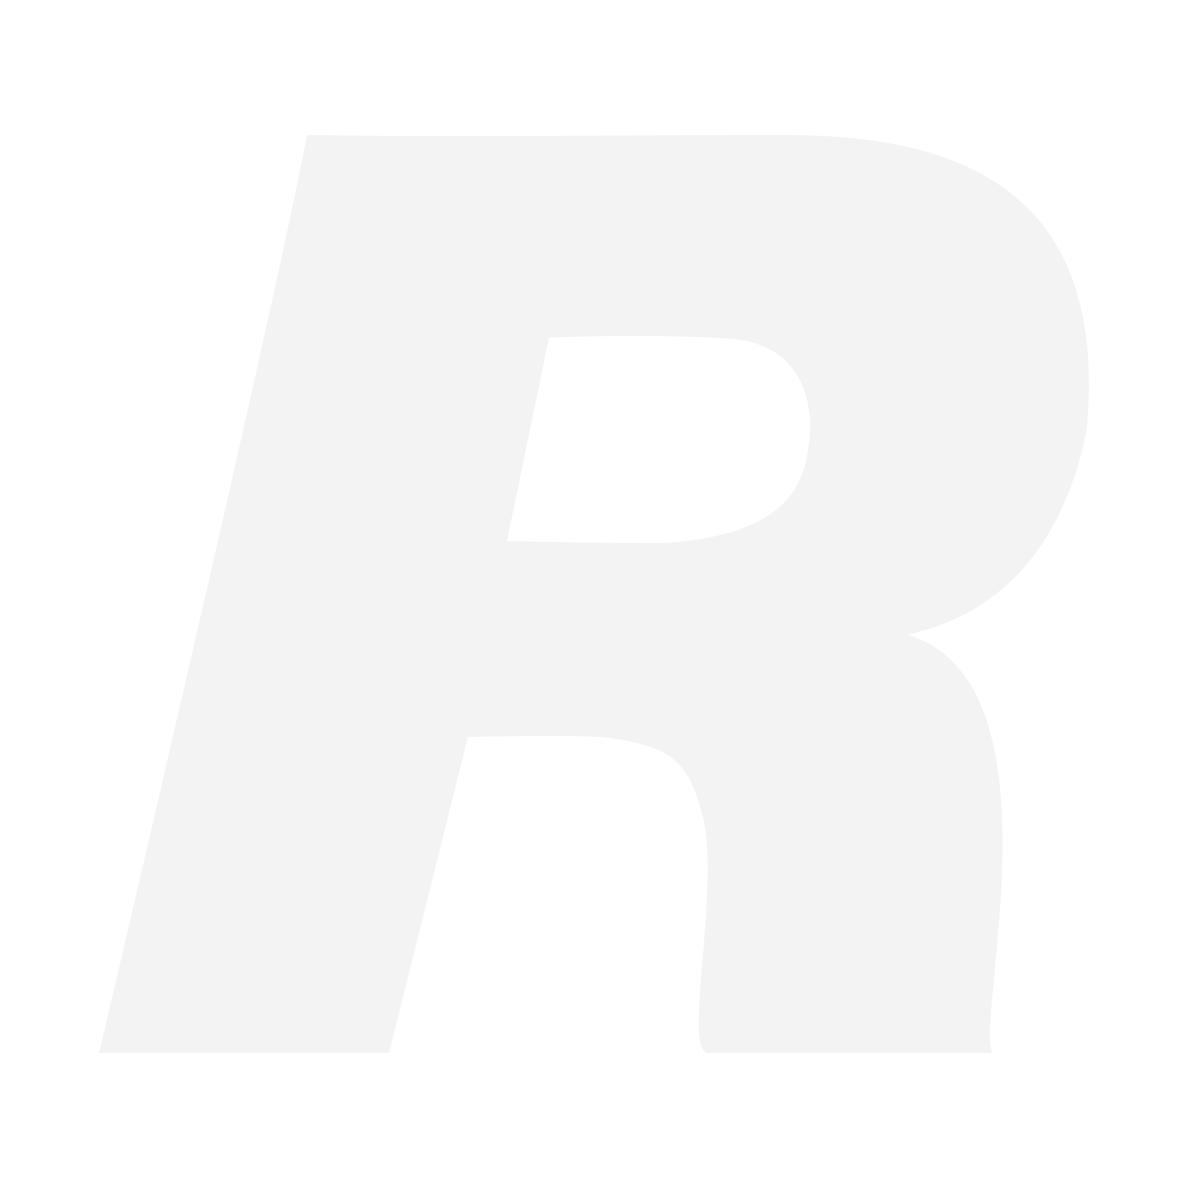 Godox Reemix 3-in-1 Remote Control N2 (Nikon)